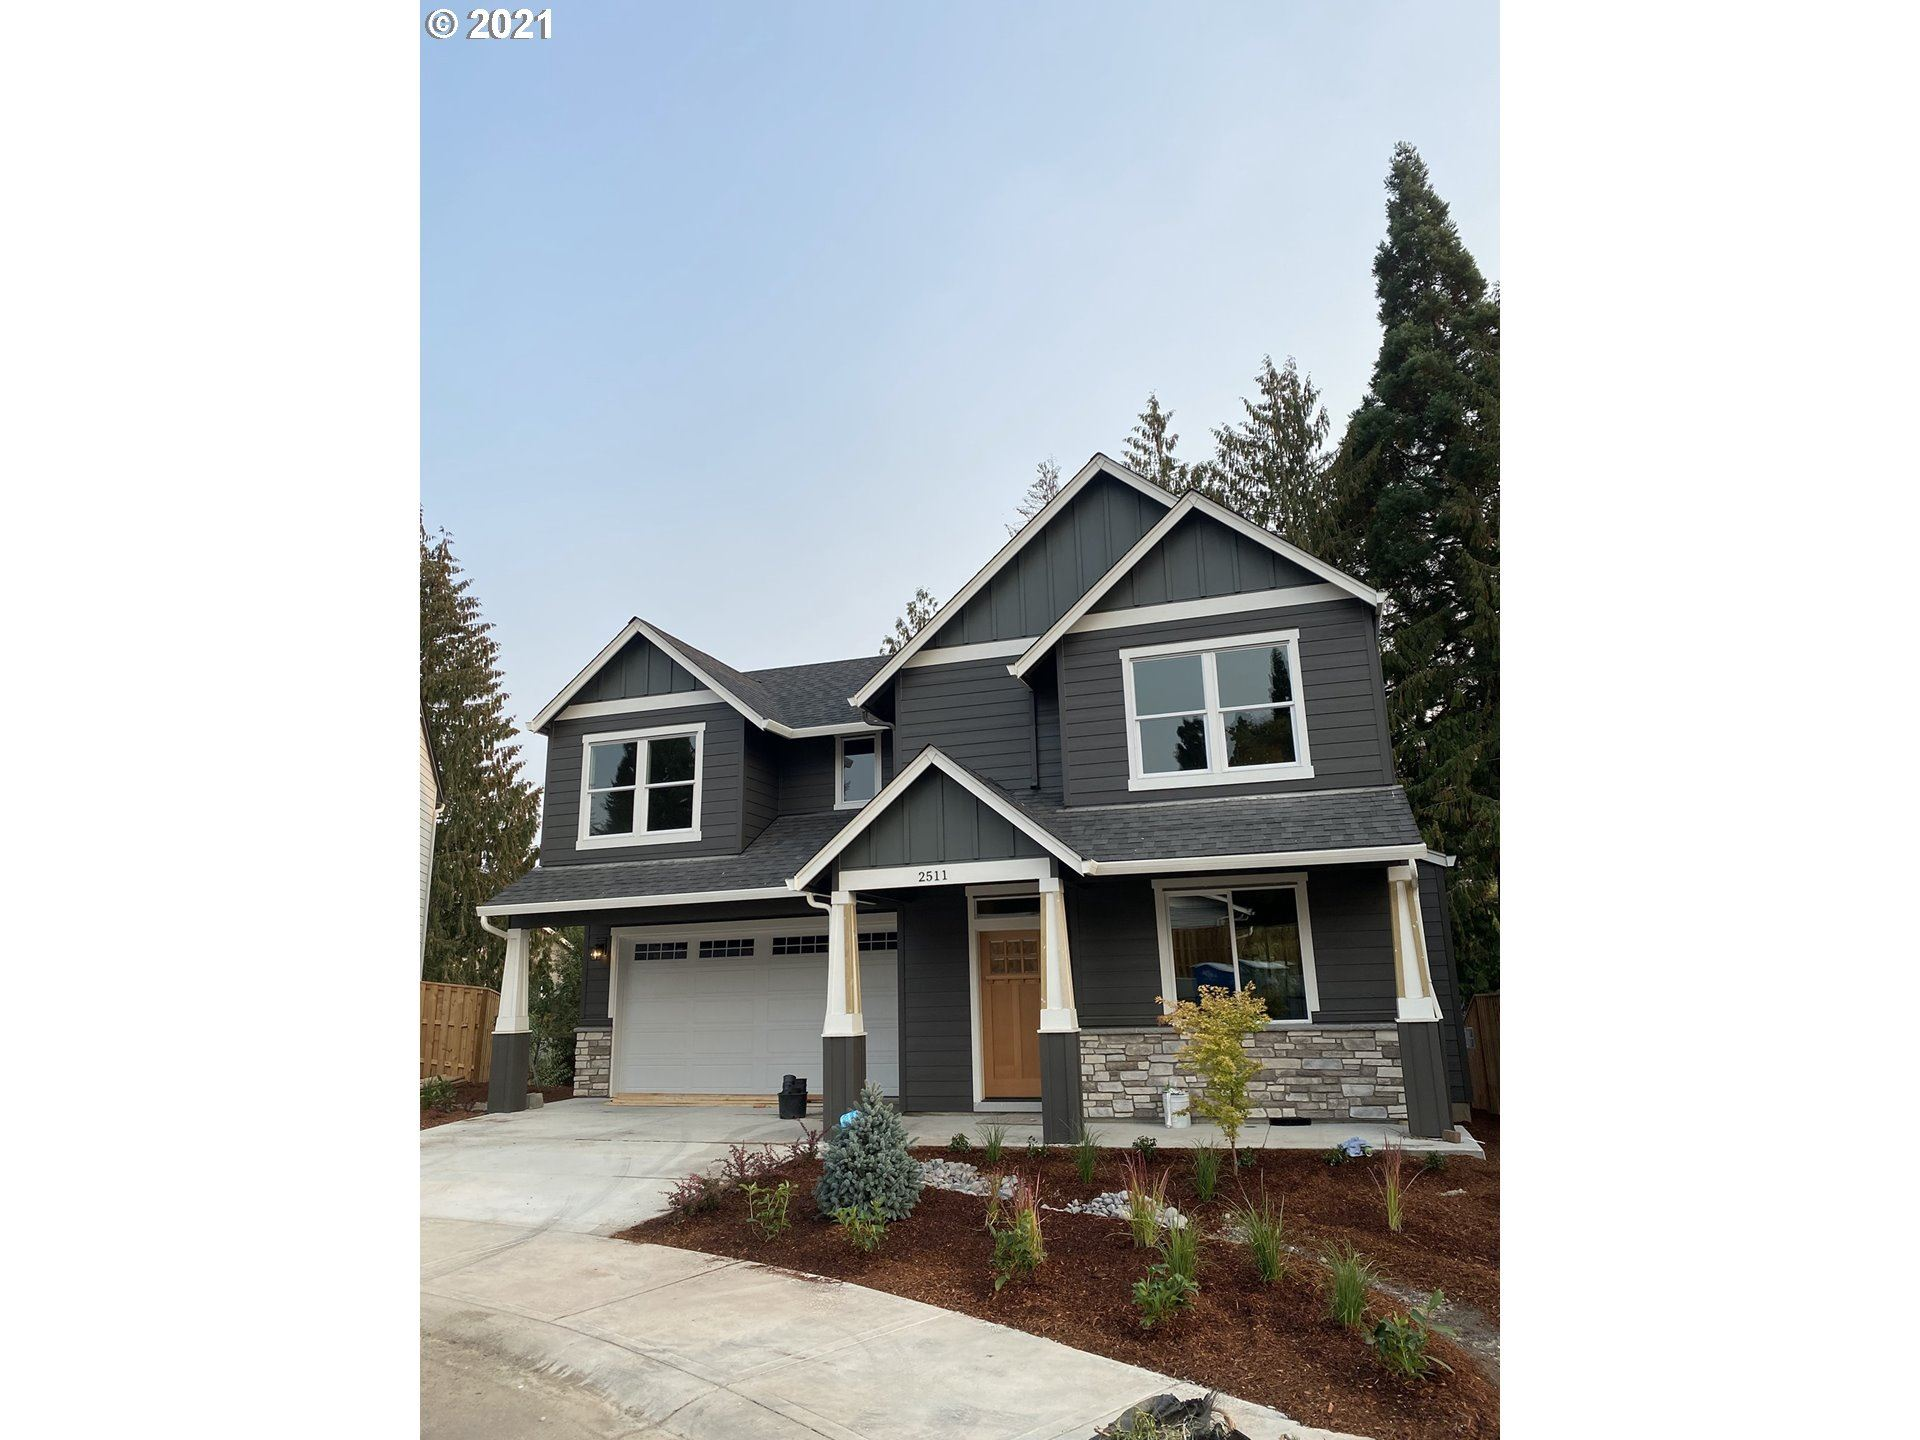 2511 NE 85TH CIR, Vancouver, WA 98665 - MLS#: 21277008